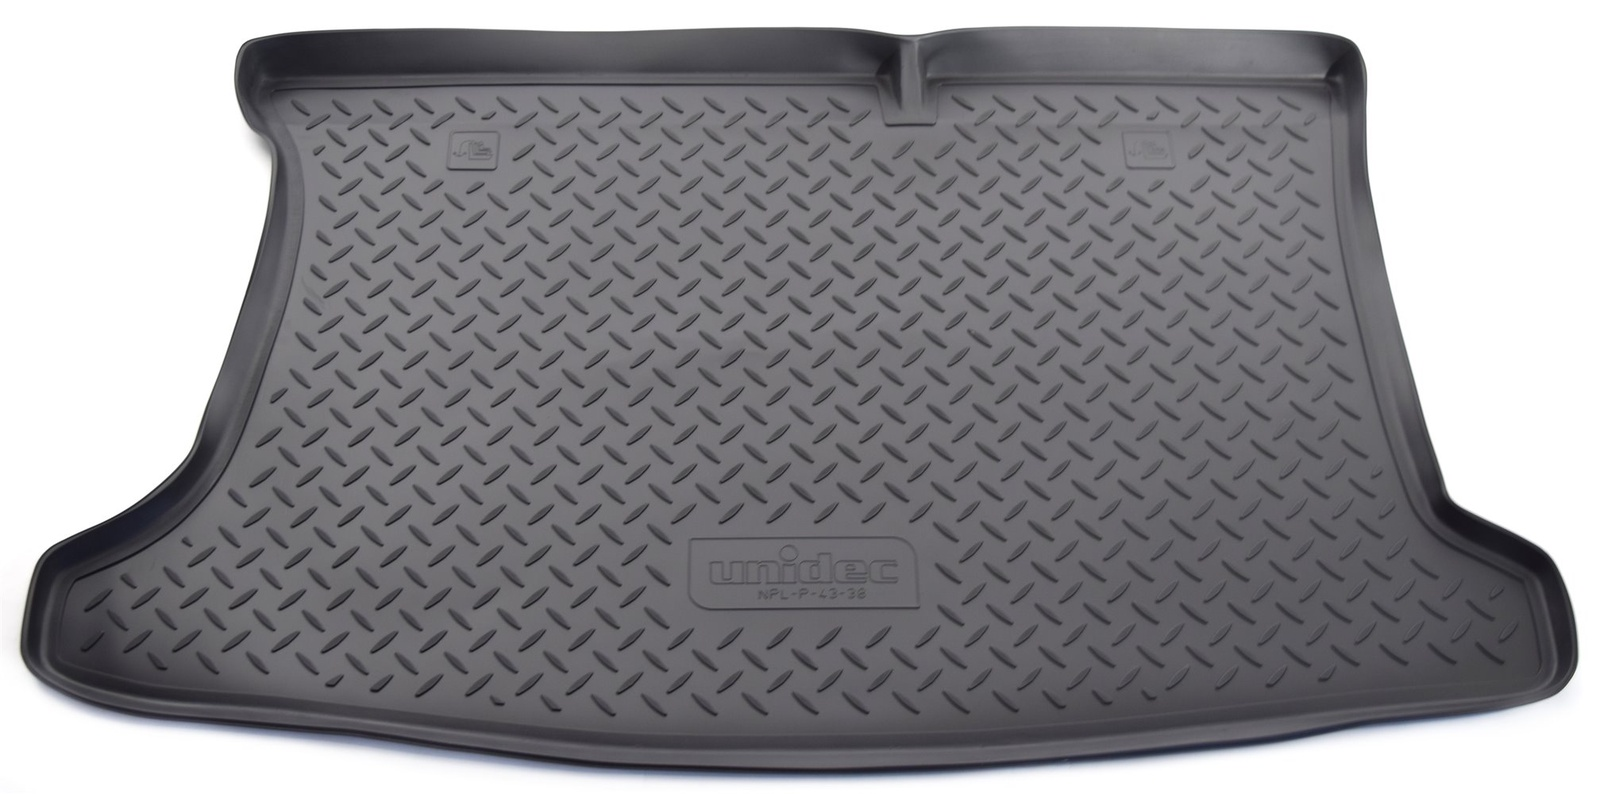 Коврик багажника Norplast для Kia Rio RUSQB HB 2012, NPL-P-43-38, черный